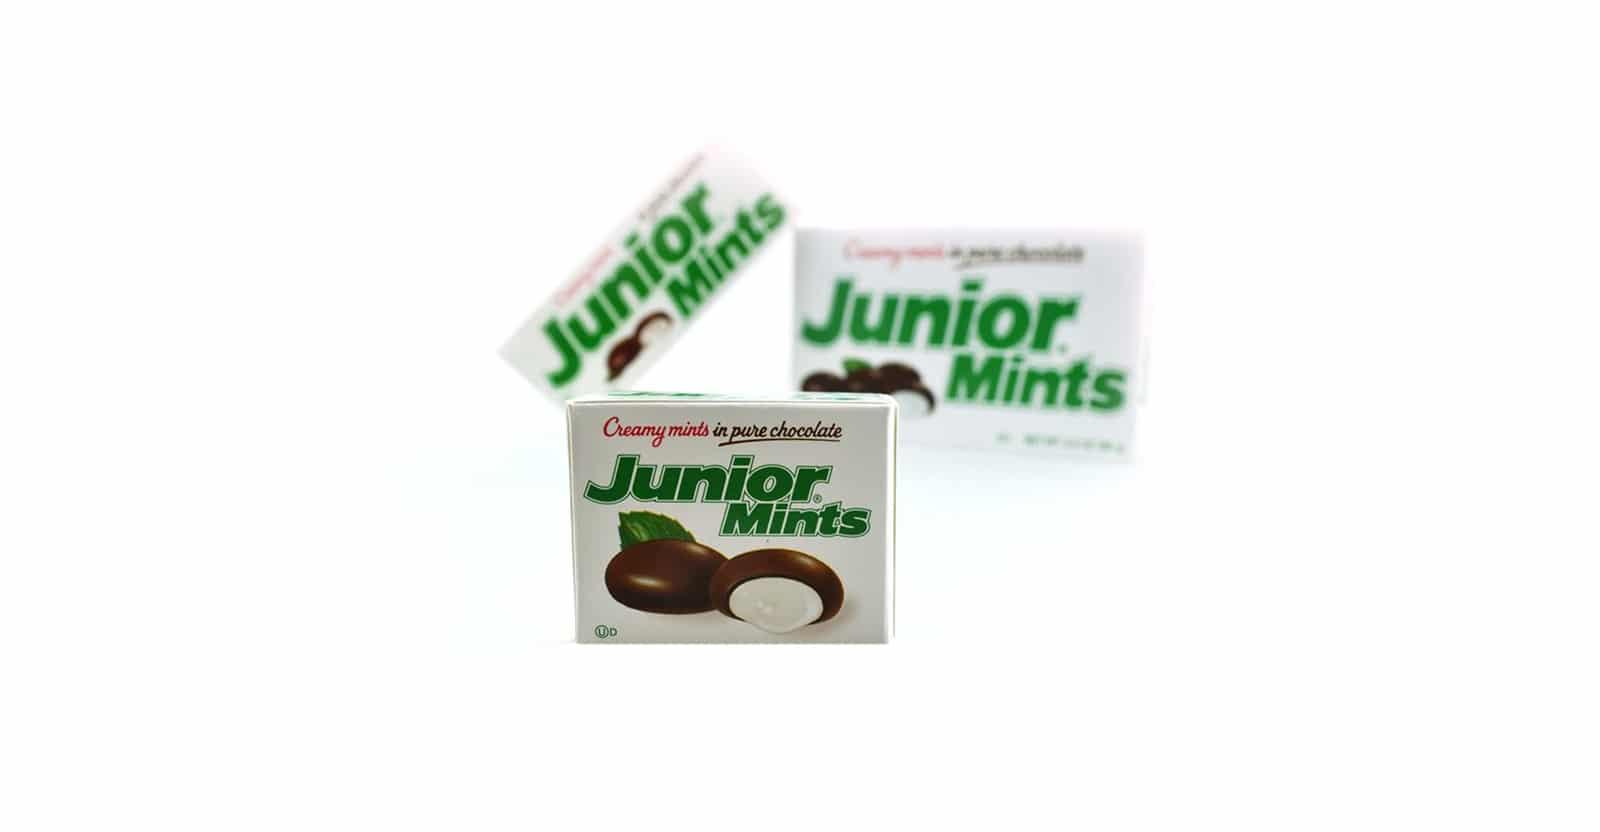 are junior mints gluten-free